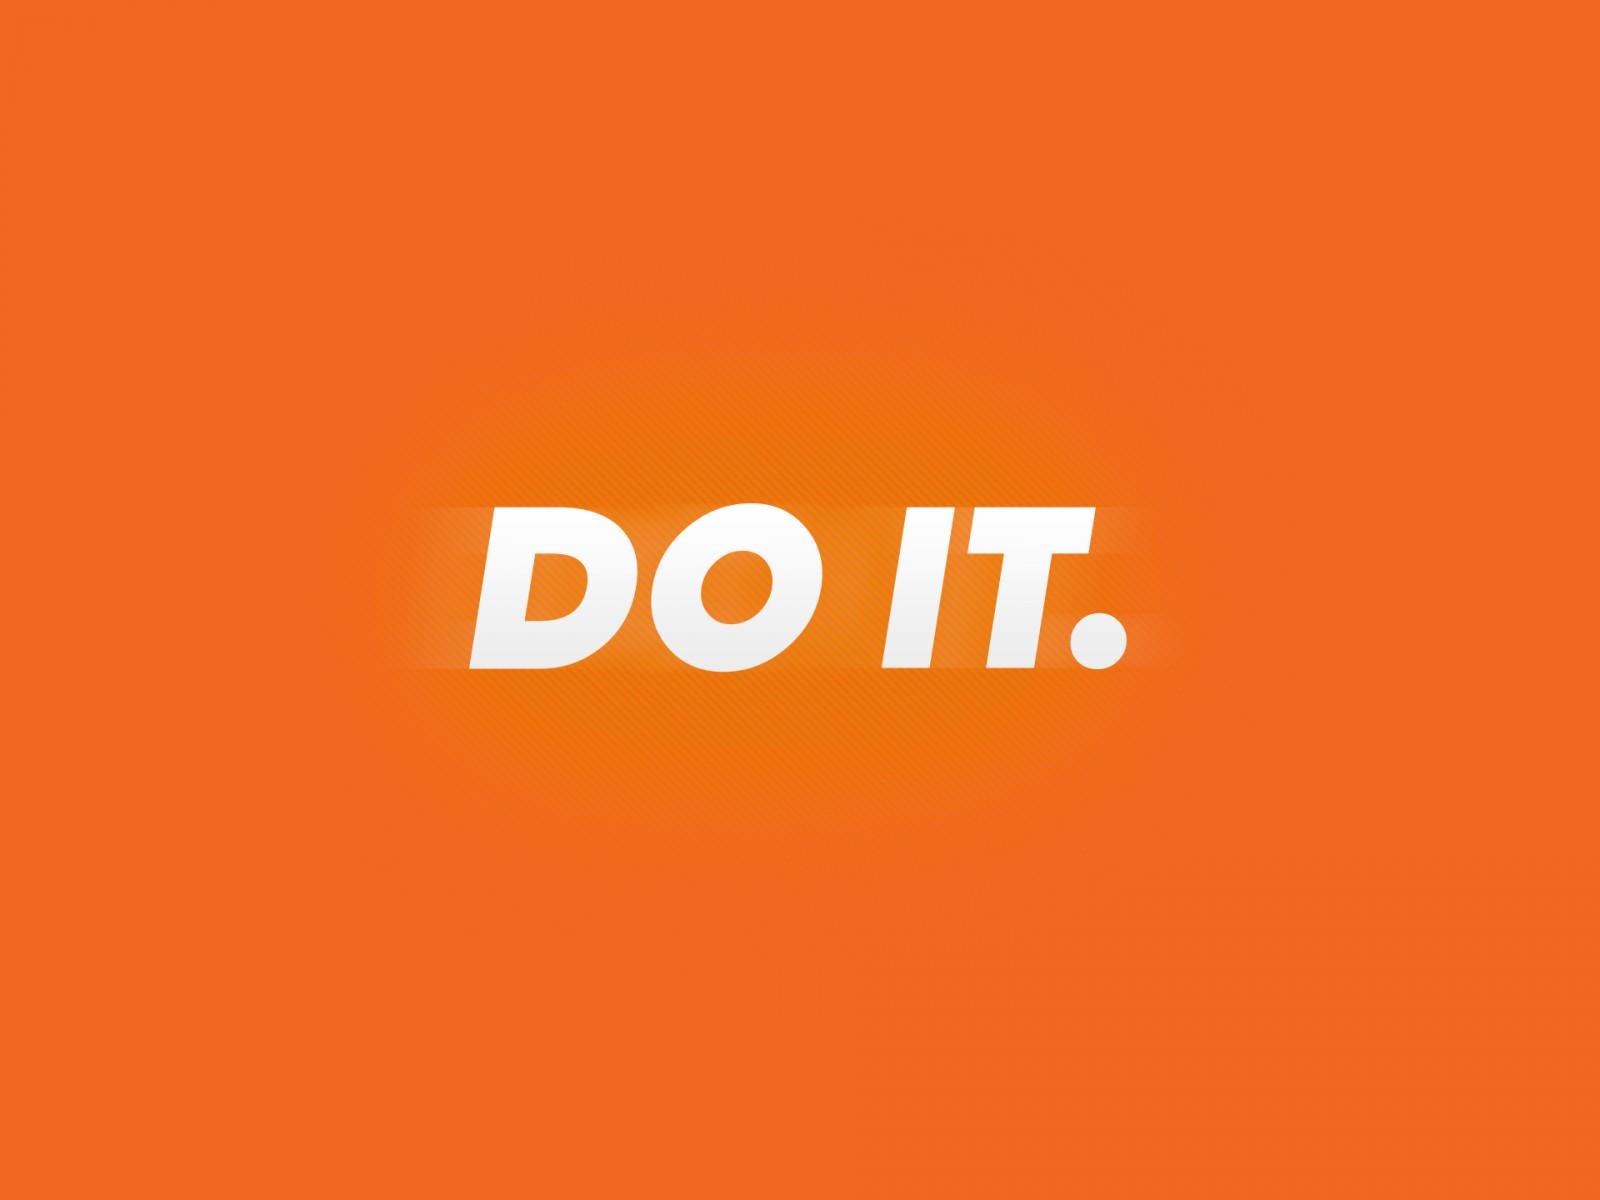 do-it-orange-minimal-wallpaper-2560x1440-A-1600x1200